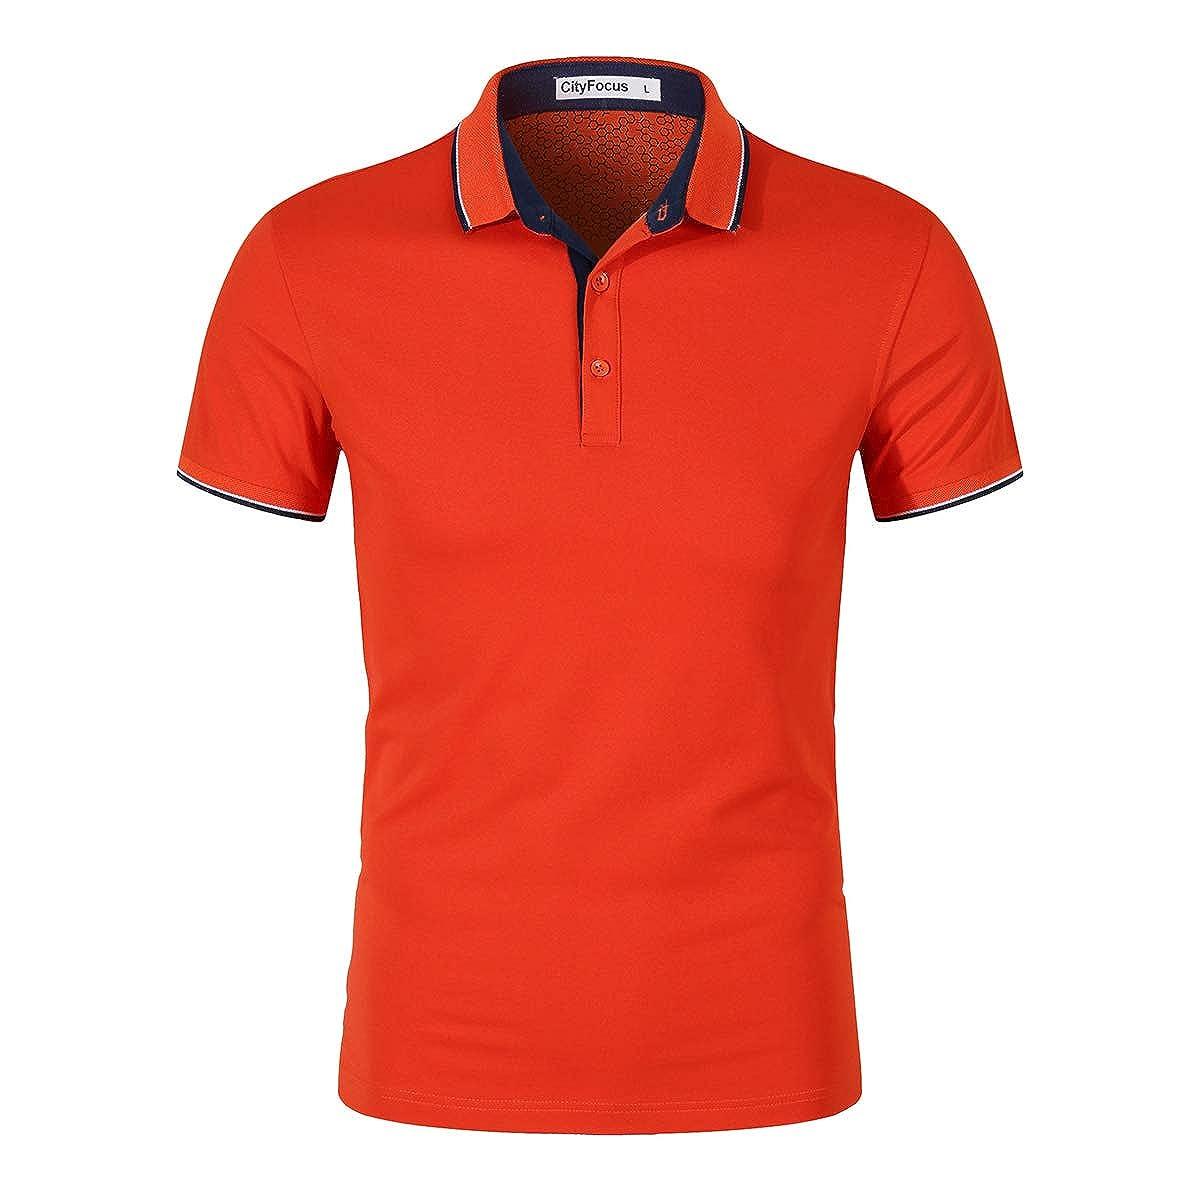 New Mens Polo Shirt Short Sleeve Plain Tee Twin Contrast Tip Collar Top T-Shirt